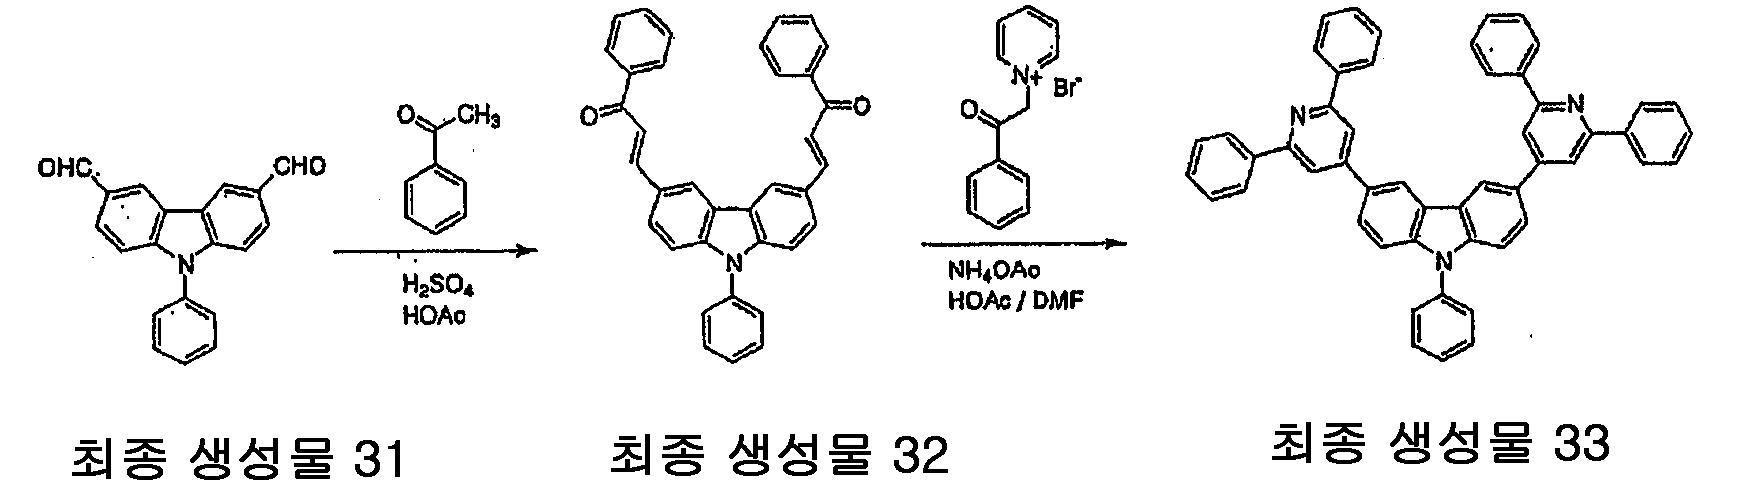 Figure 112010002231902-pat00125